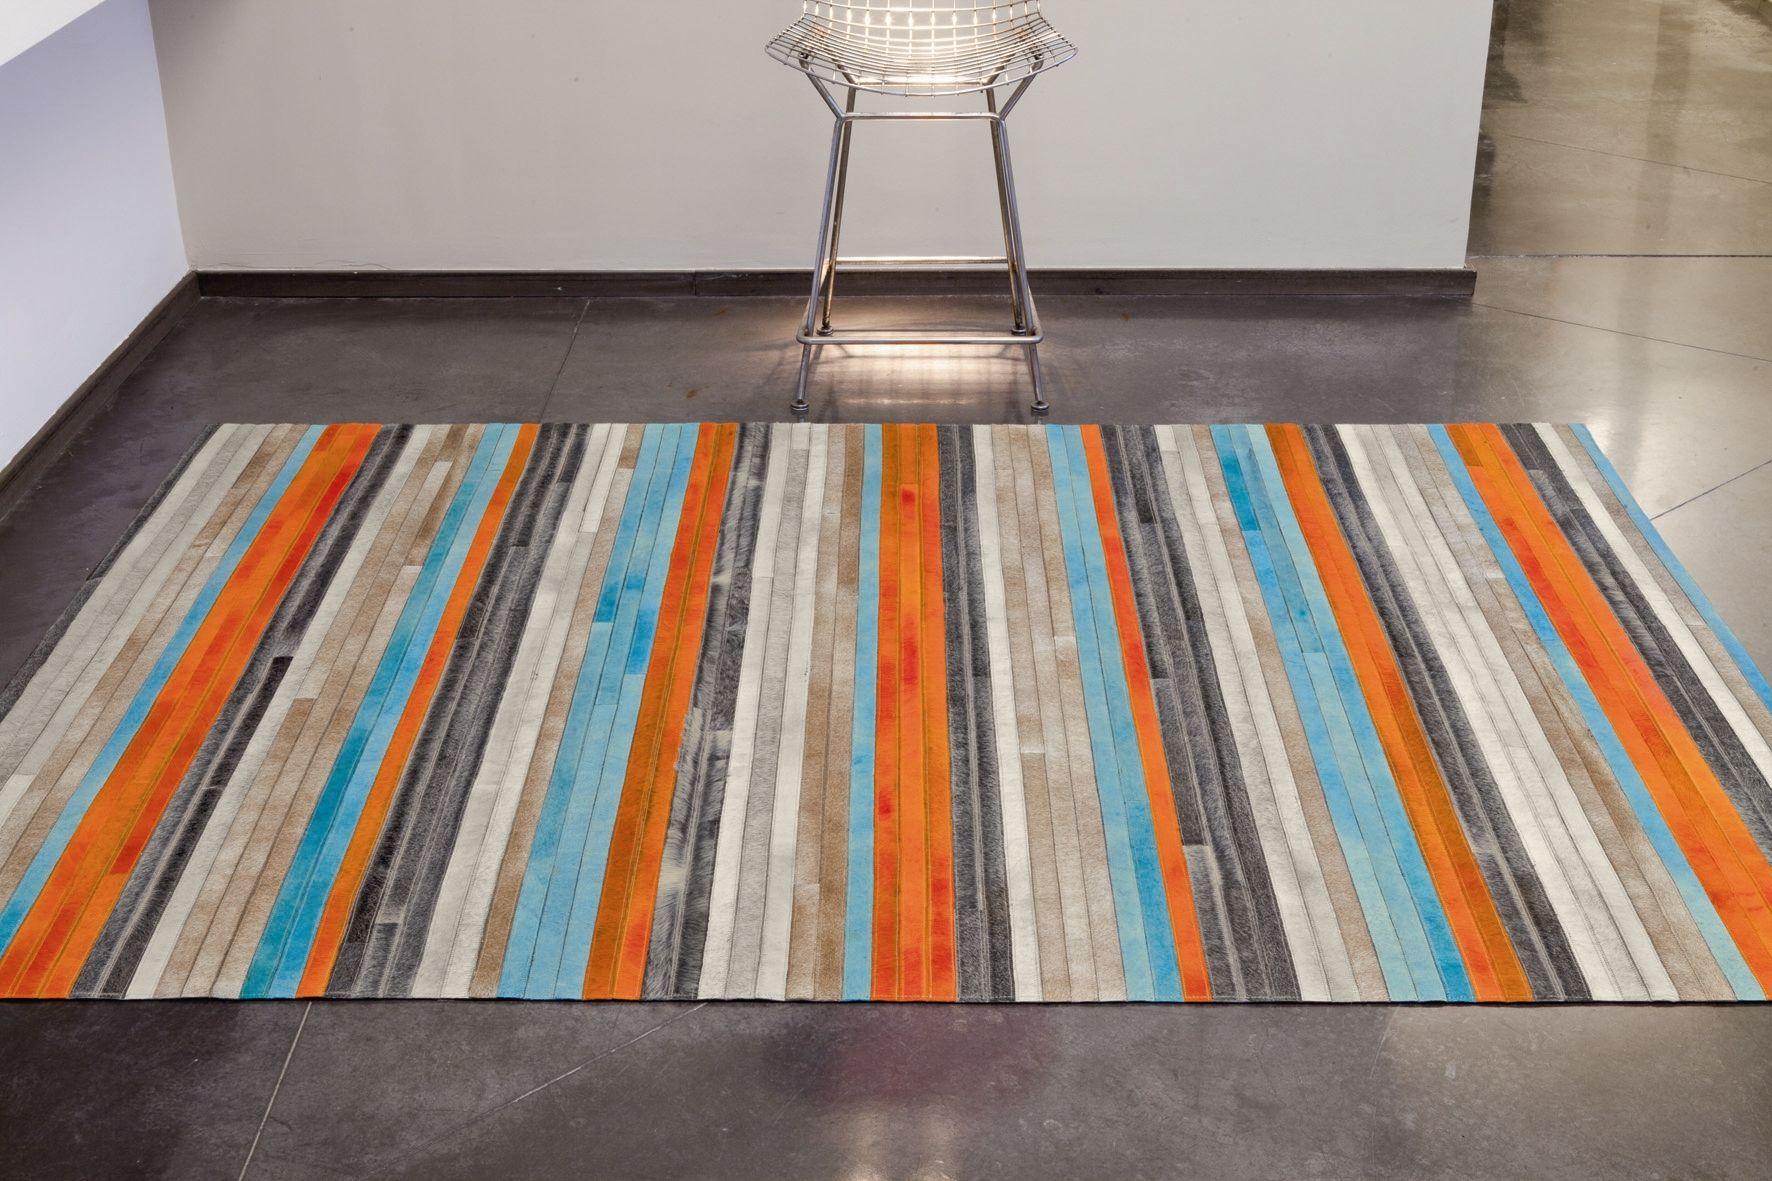 Tapis Salon Couleur Rouille serge lesage - tapis baileyton multico #tapis #color #home